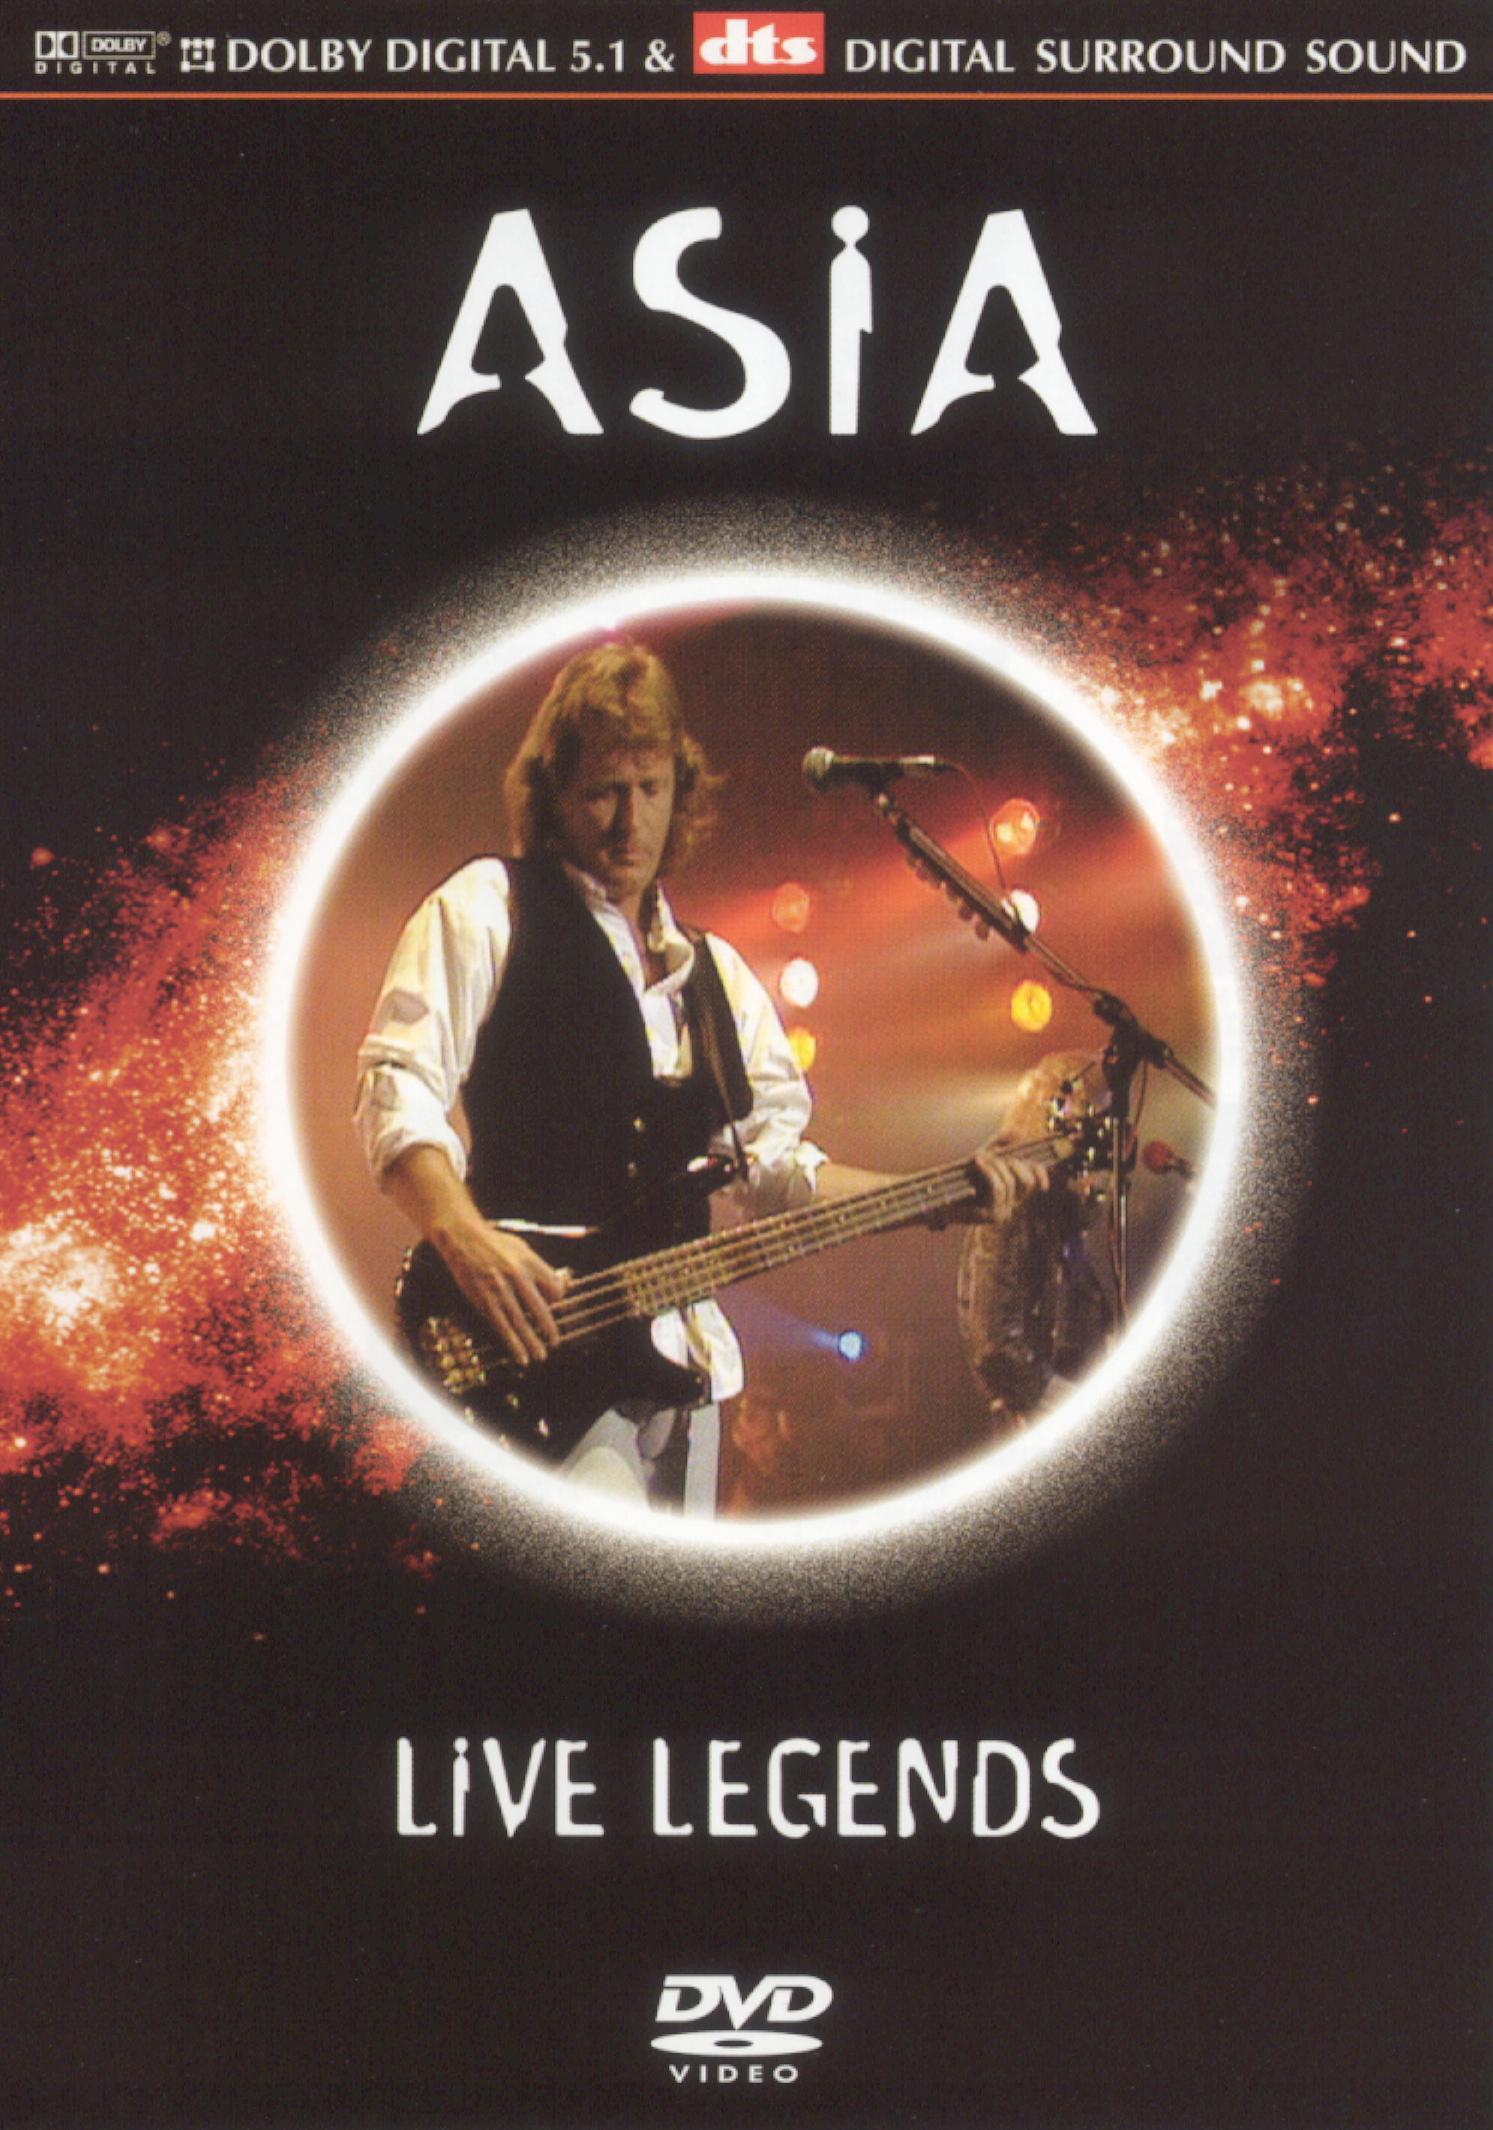 Asia: Live Legends